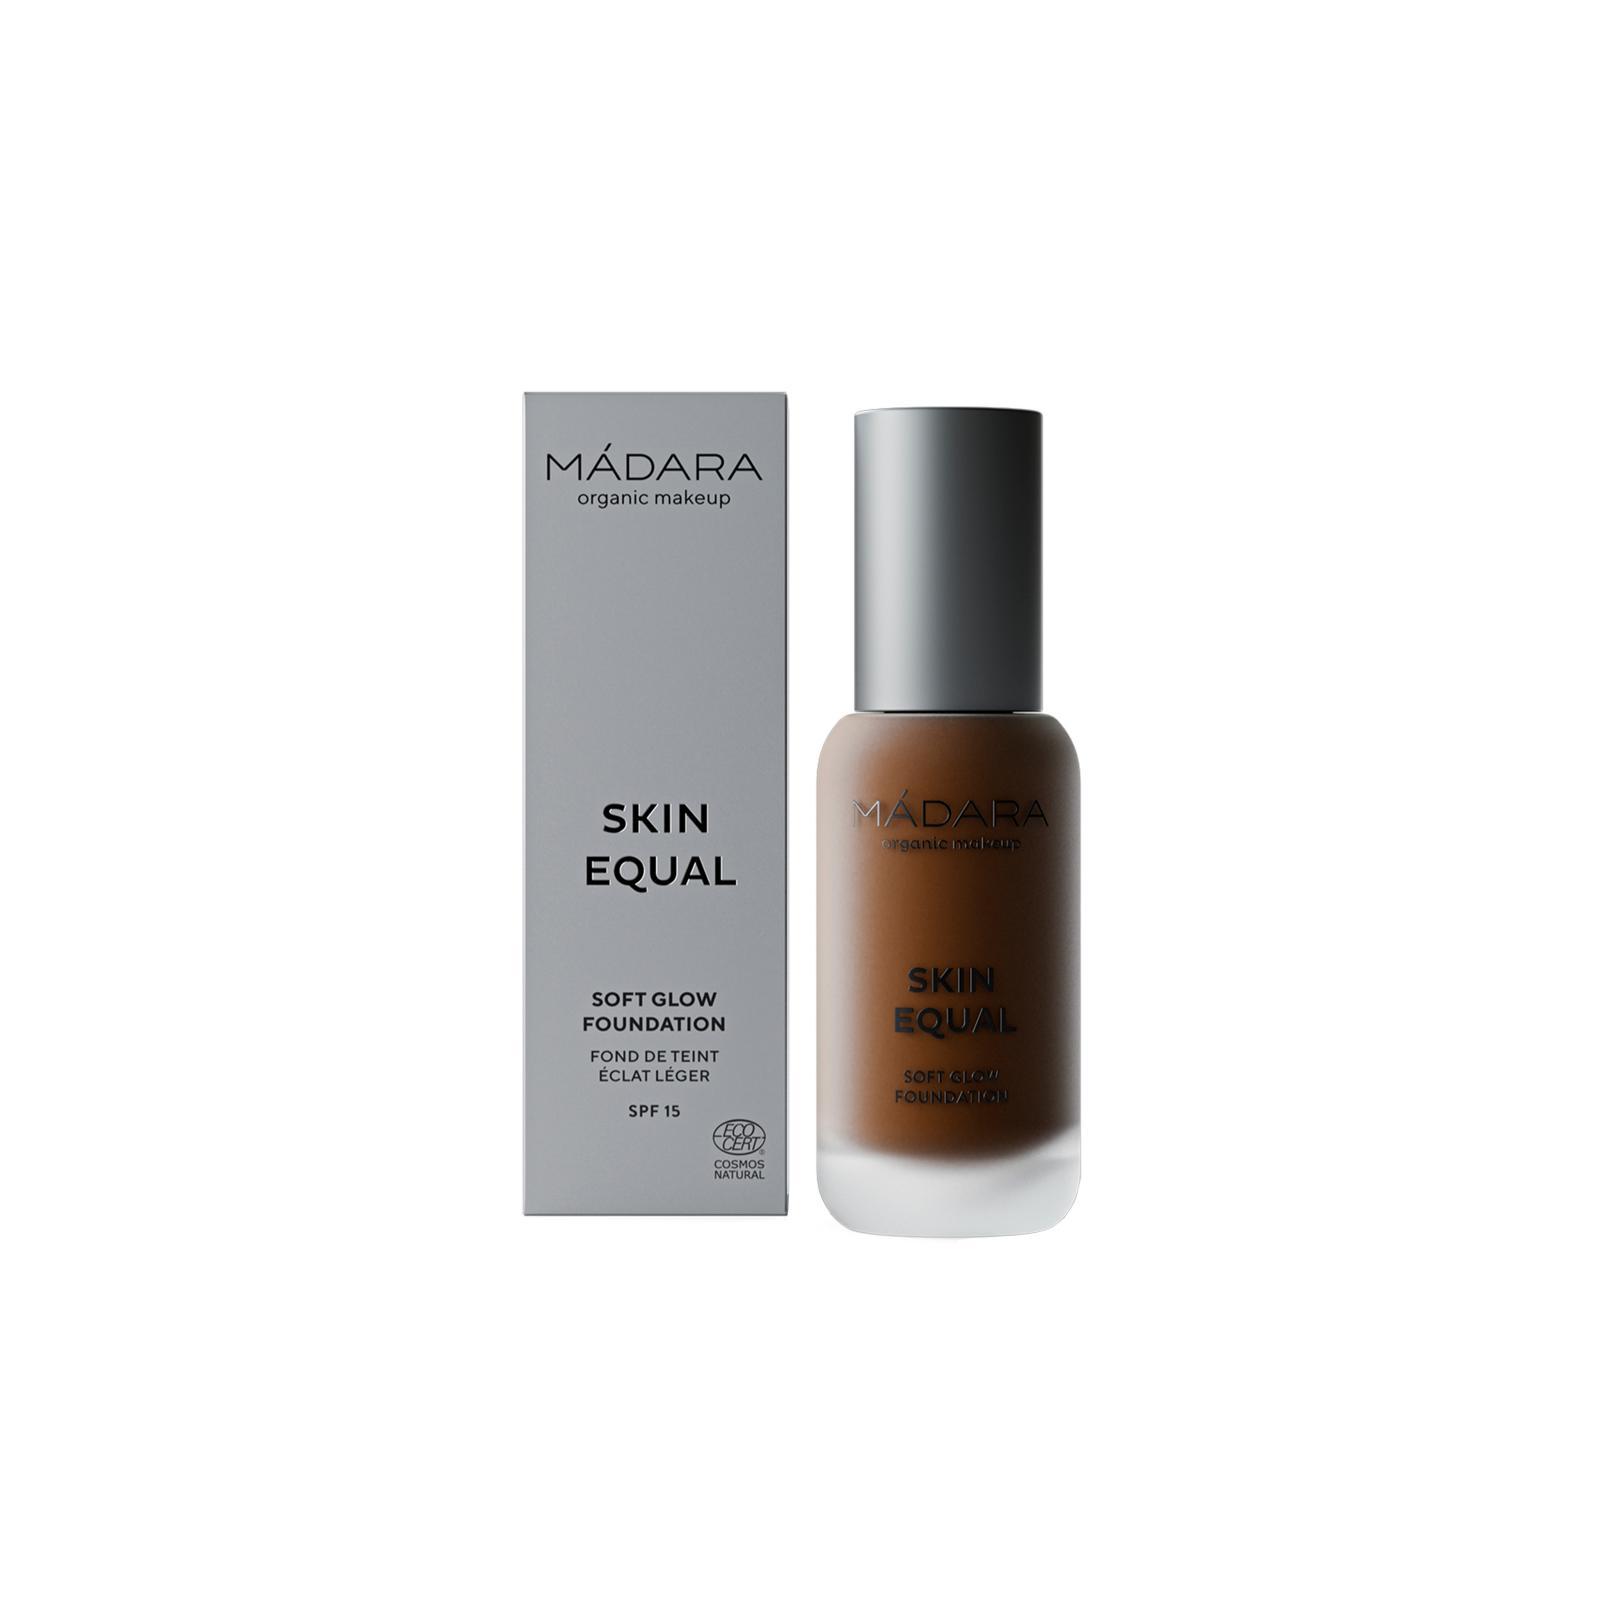 MÁDARA Make-up s SPF 15, Mocha 100 30 ml